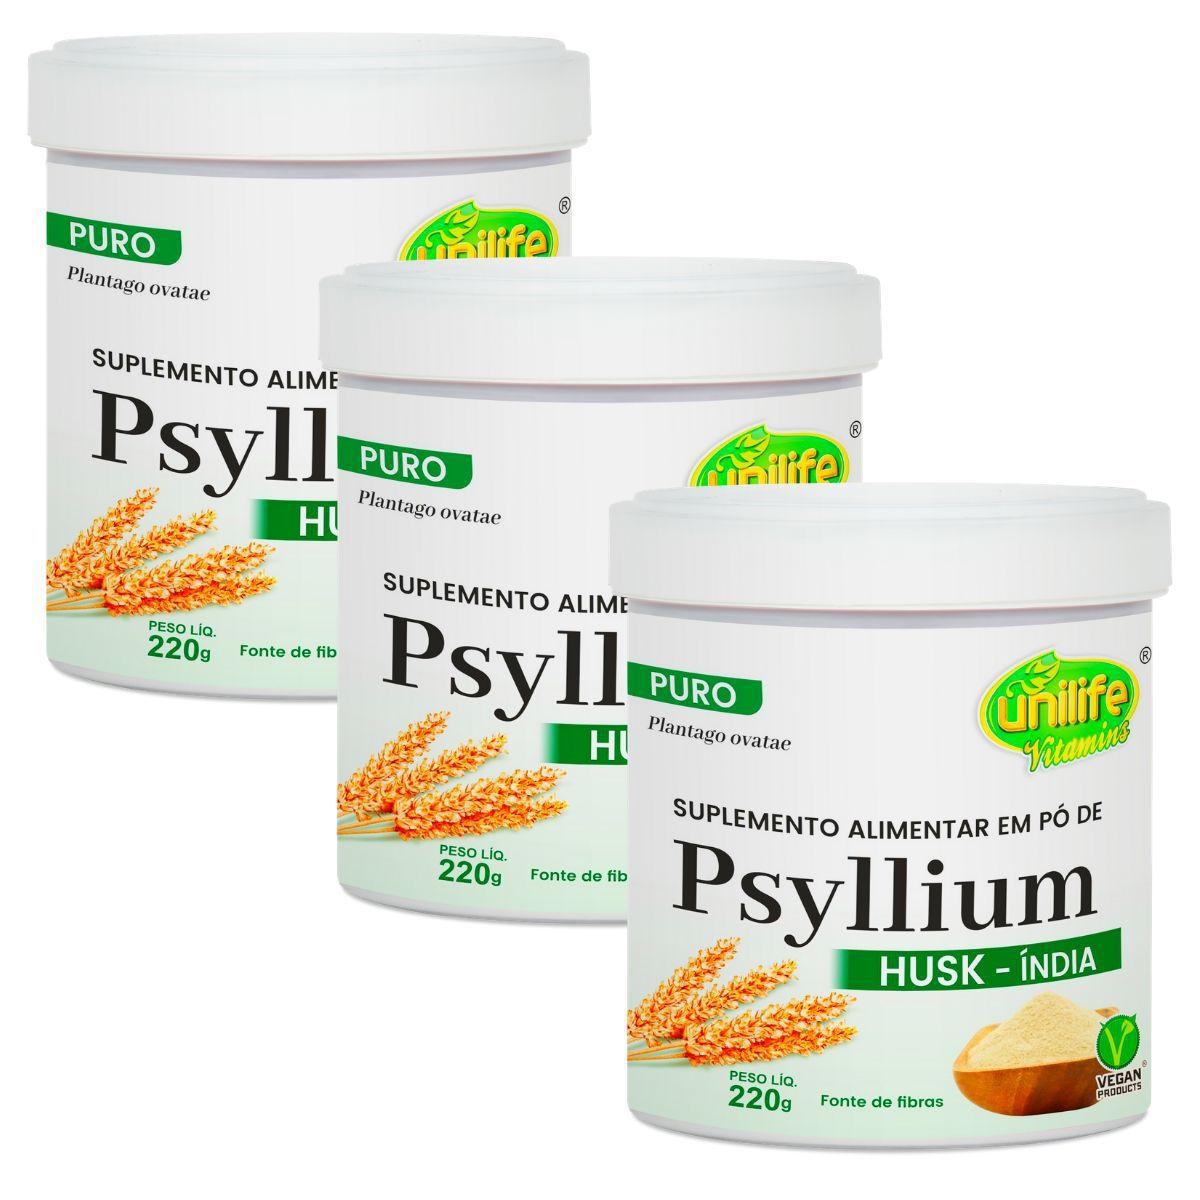 Kit 3 Psyllium Husk Em Pó 220g - Unilife